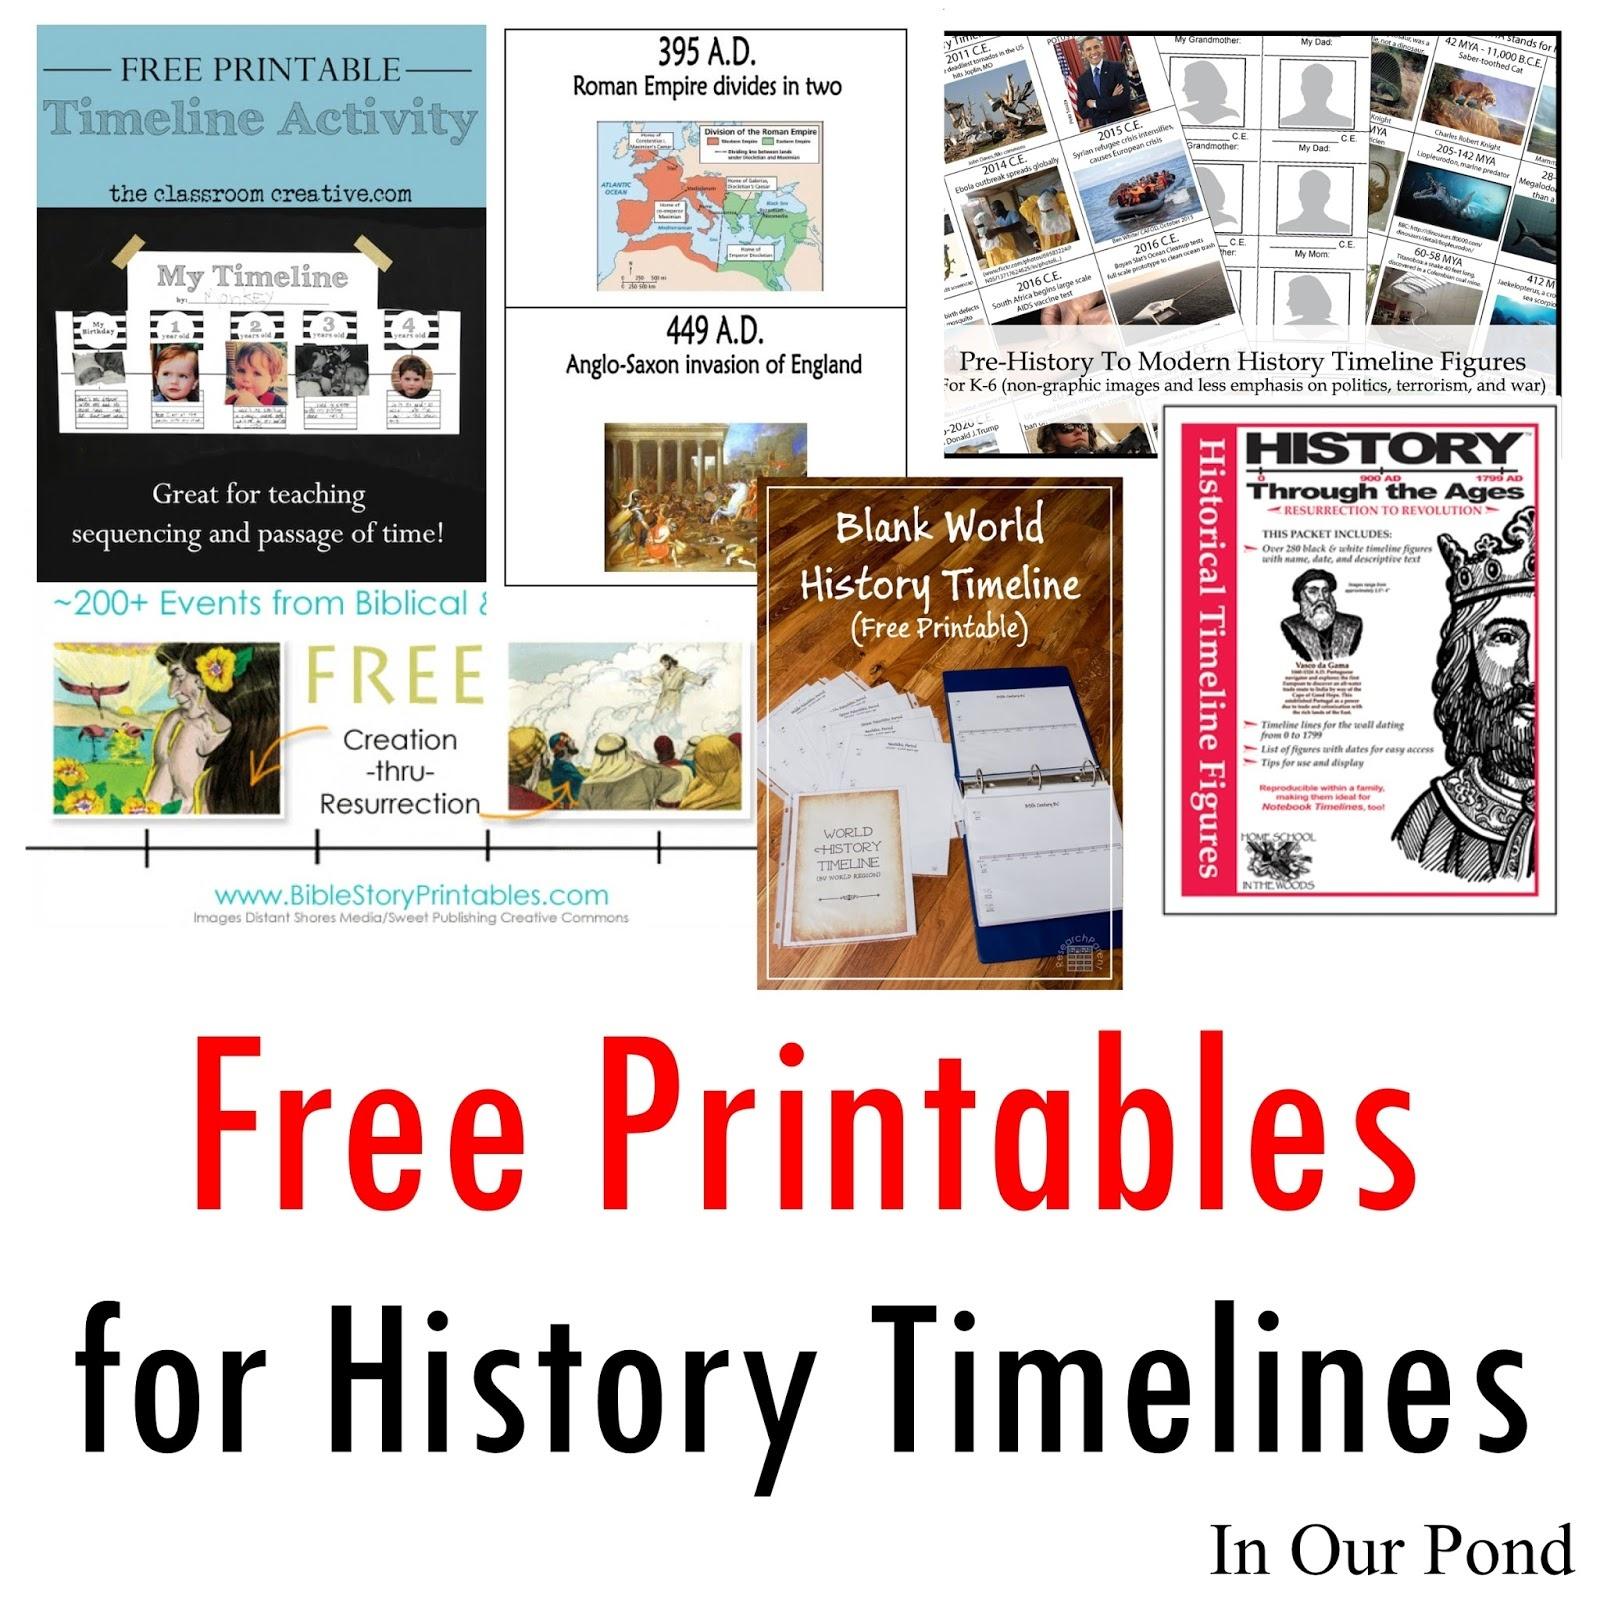 Free Printables For History Timelines - Free Printable Timeline Figures